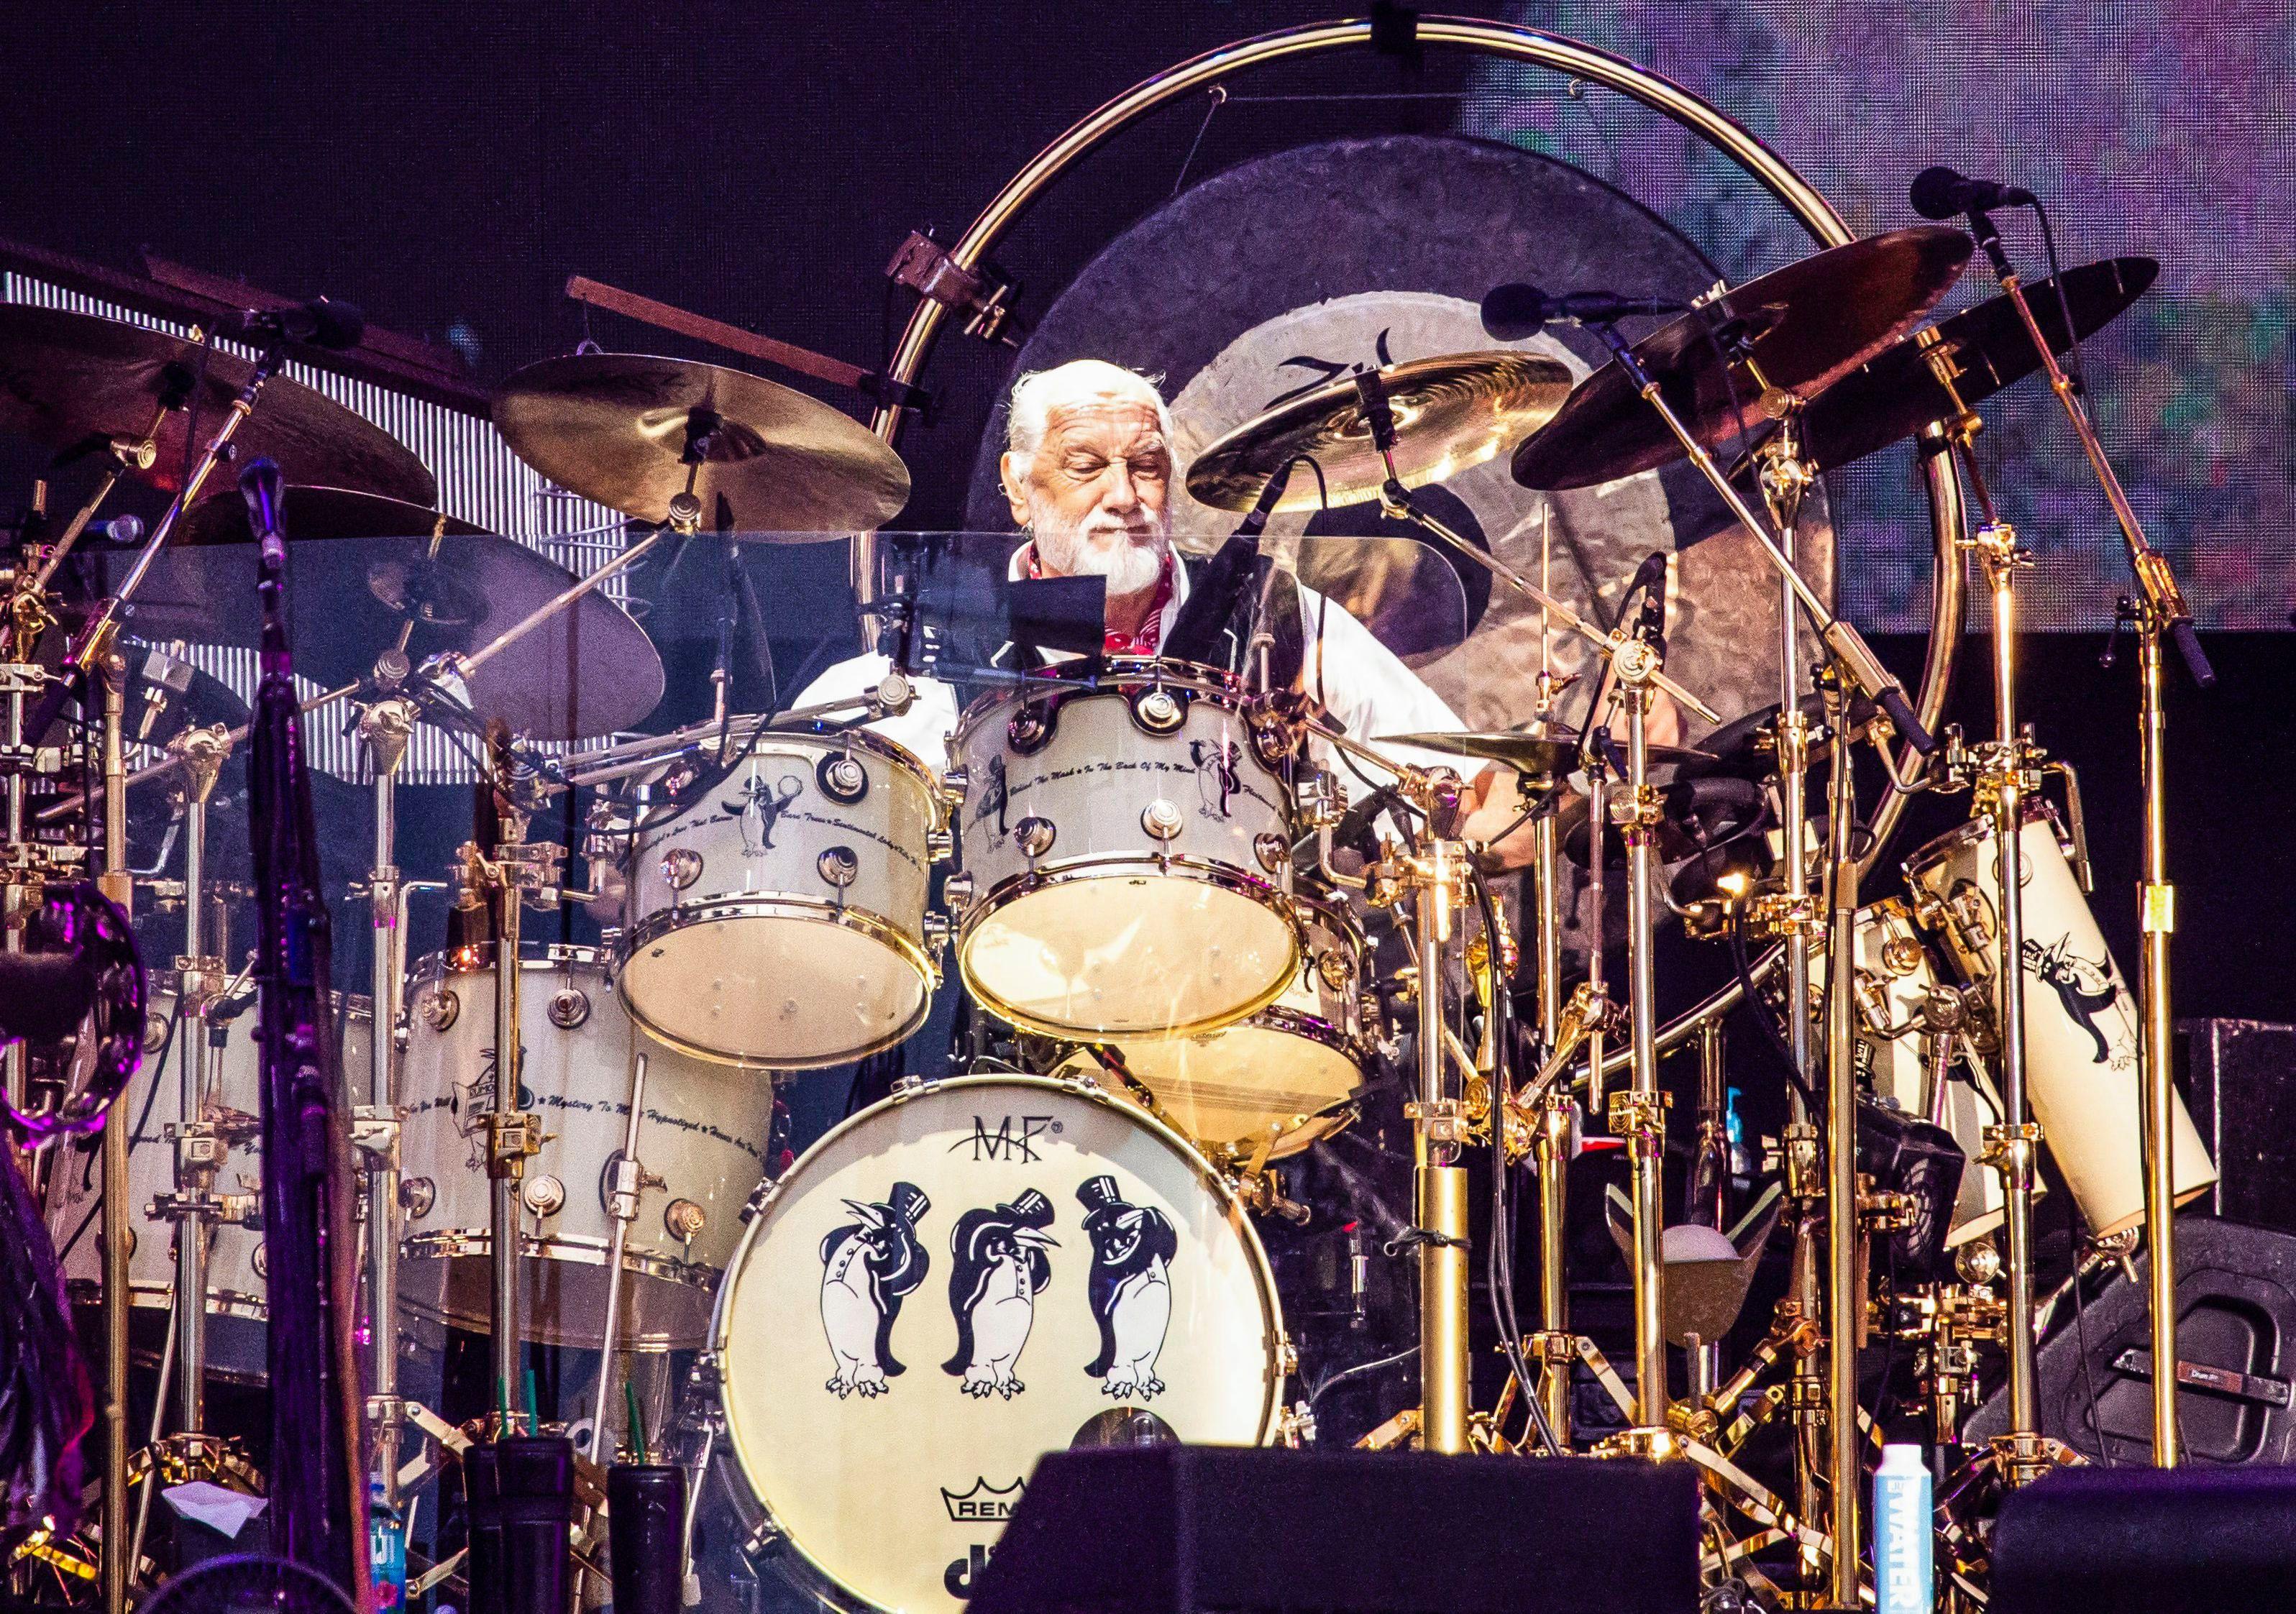 See Mick Fleetwood Honor Peter Green With David Gilmour, Steven Tyler, Neil Finn